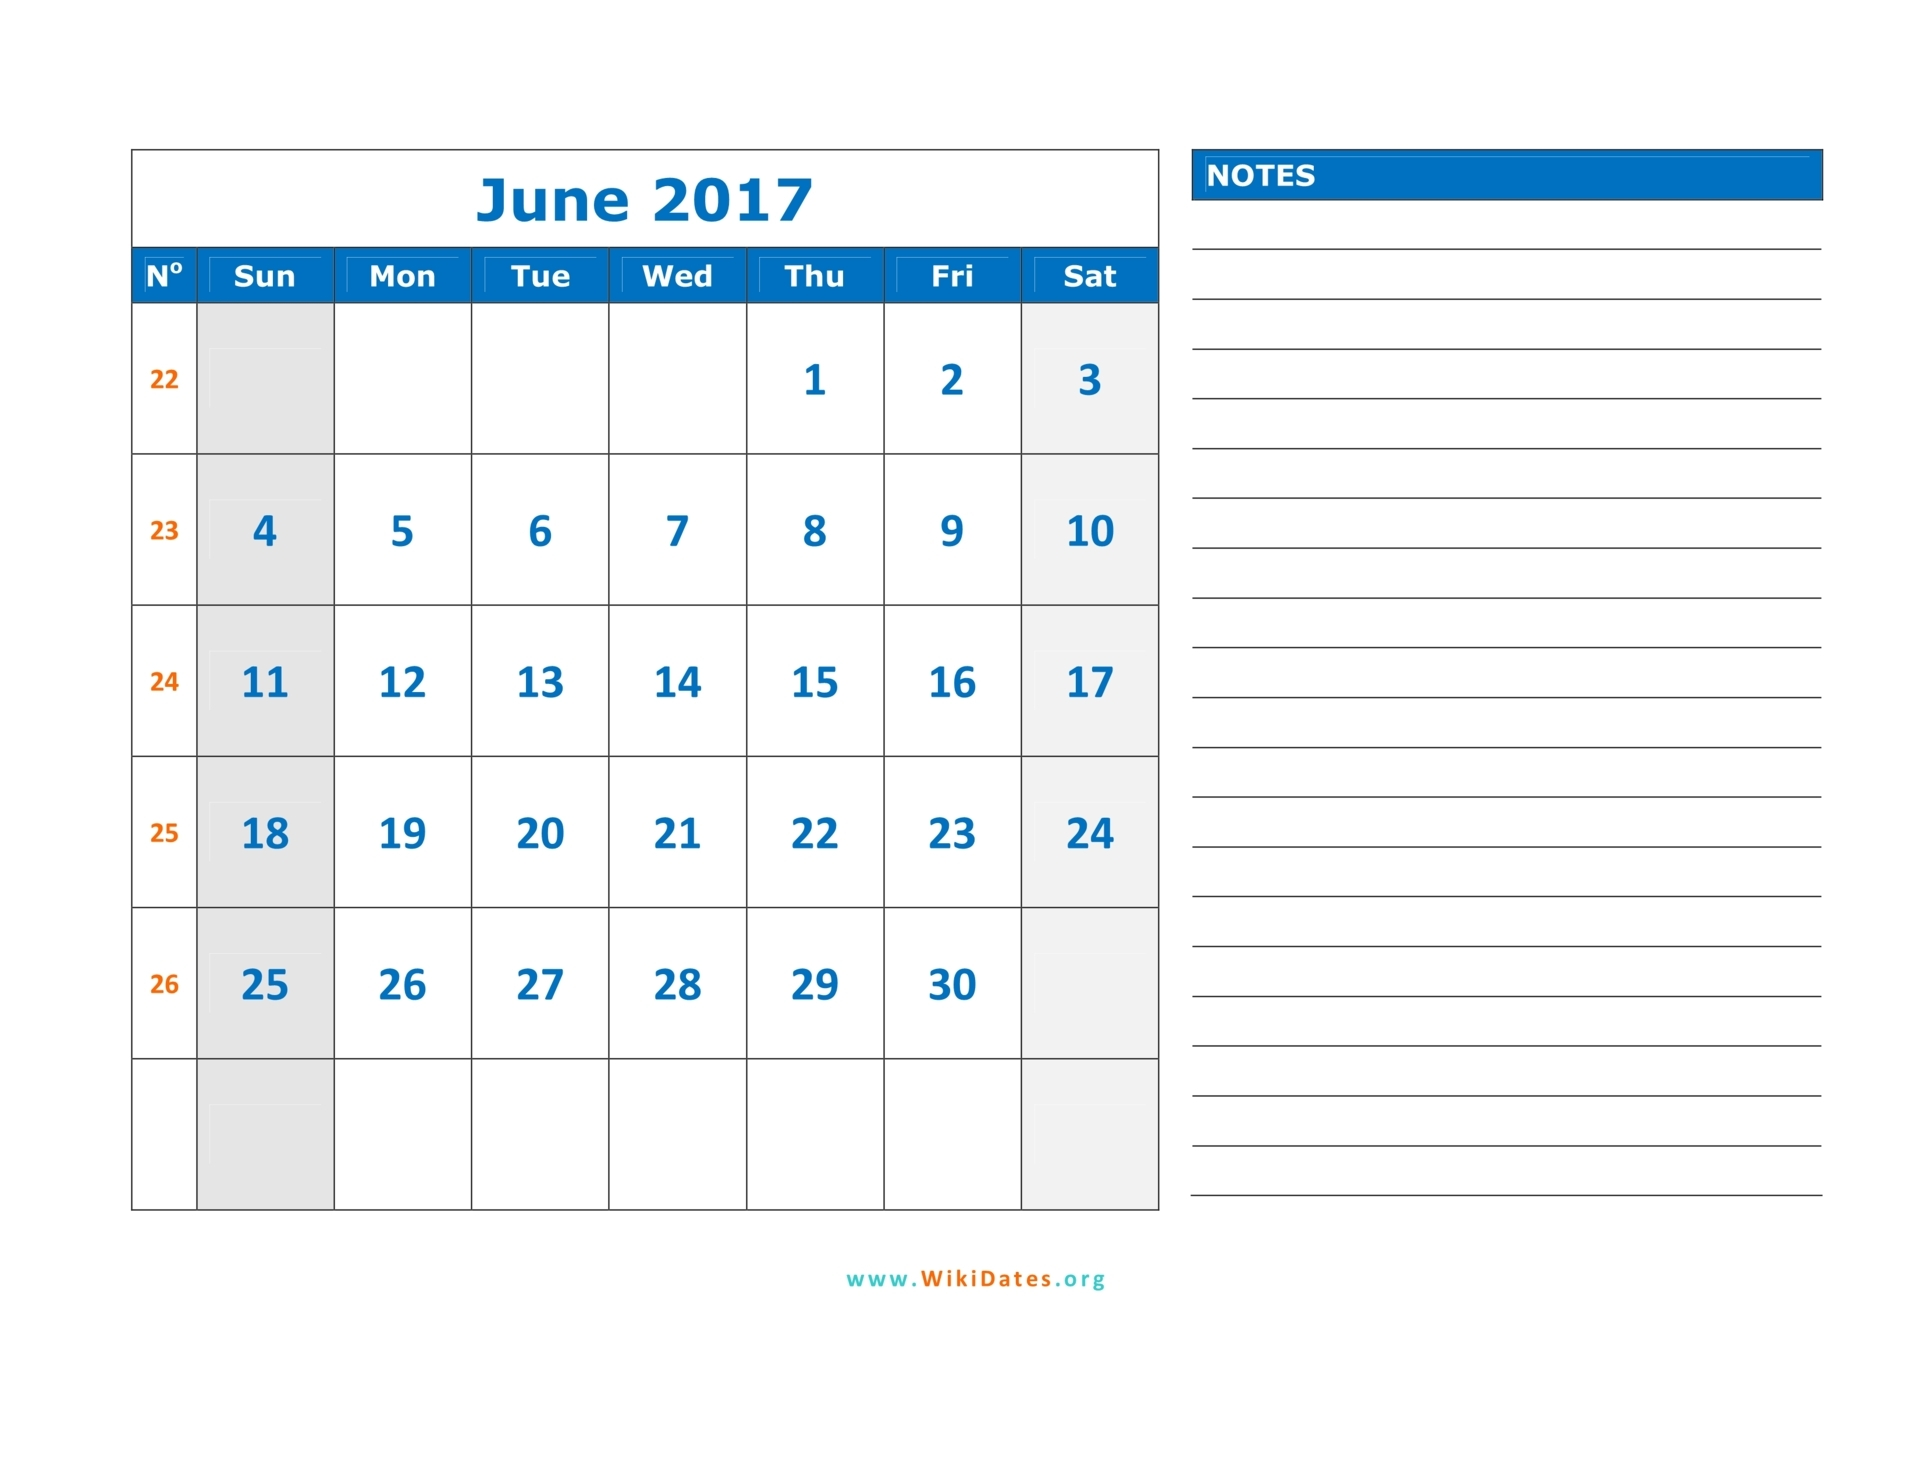 June 2017 Calendar | WikiDates.org